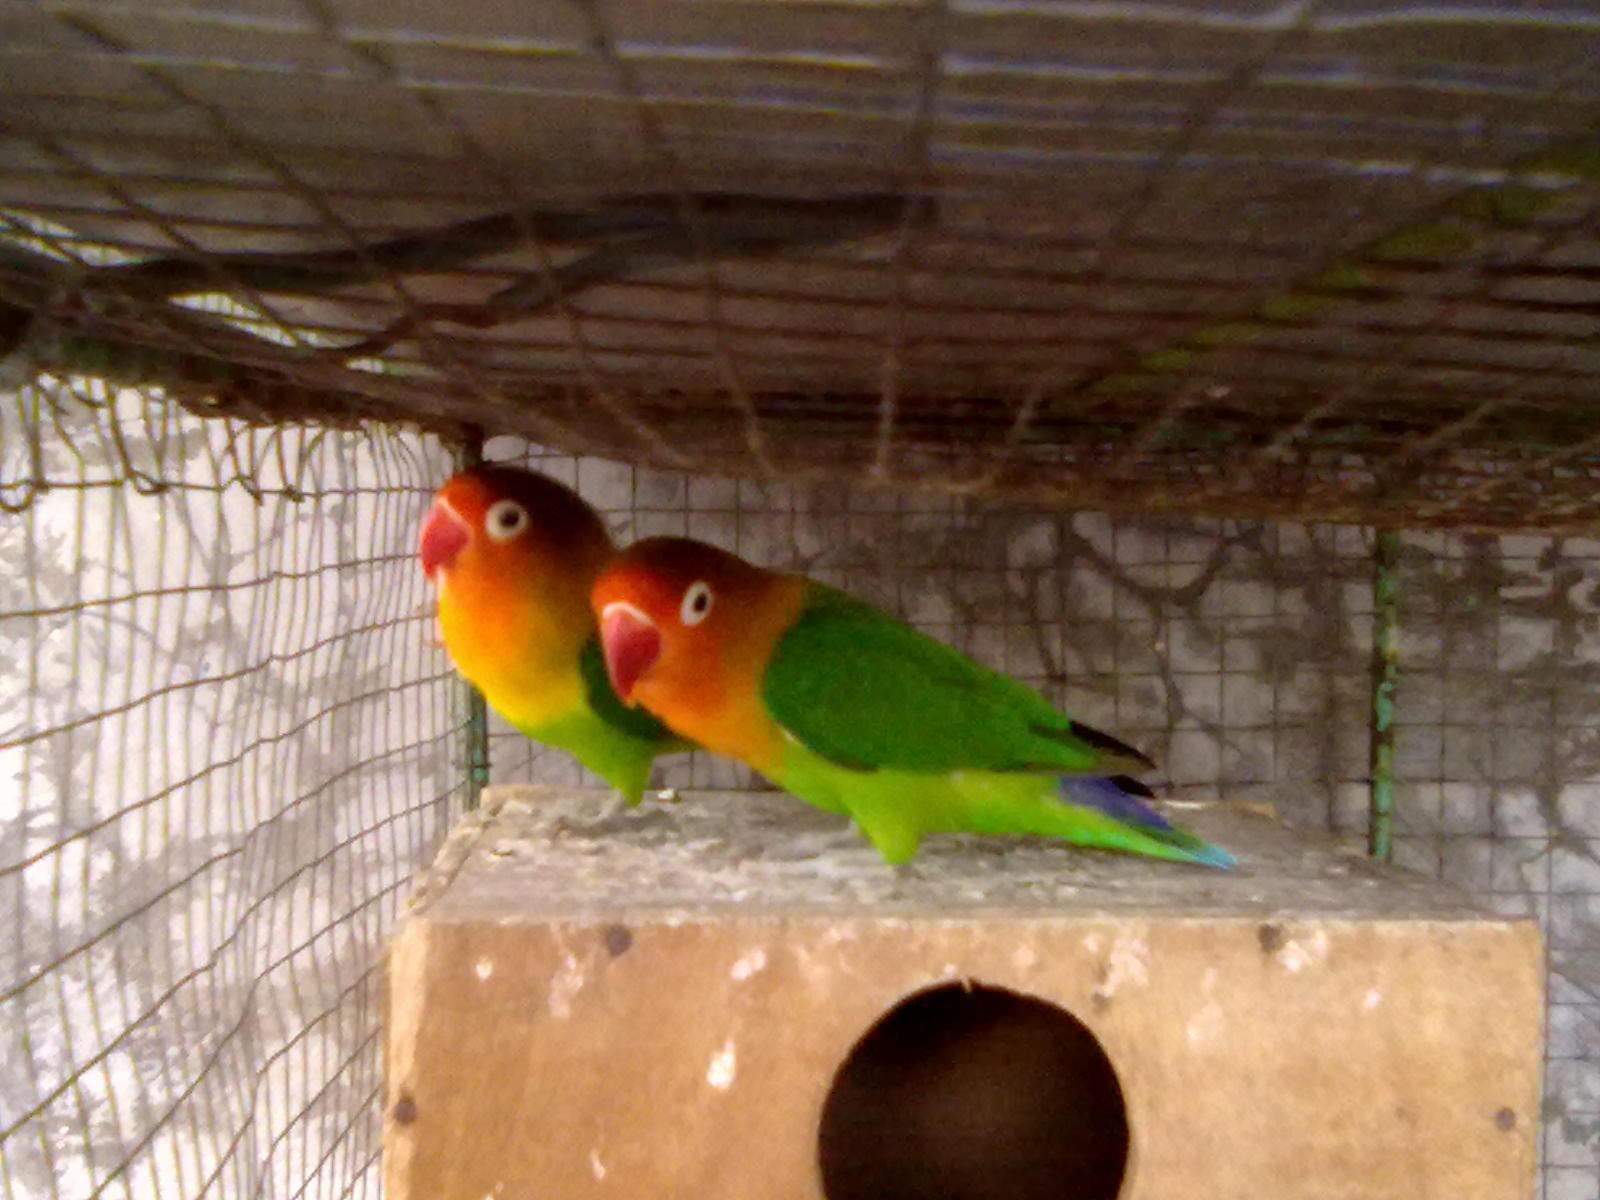 juragan love bird sepasang induk hijau kepala merah